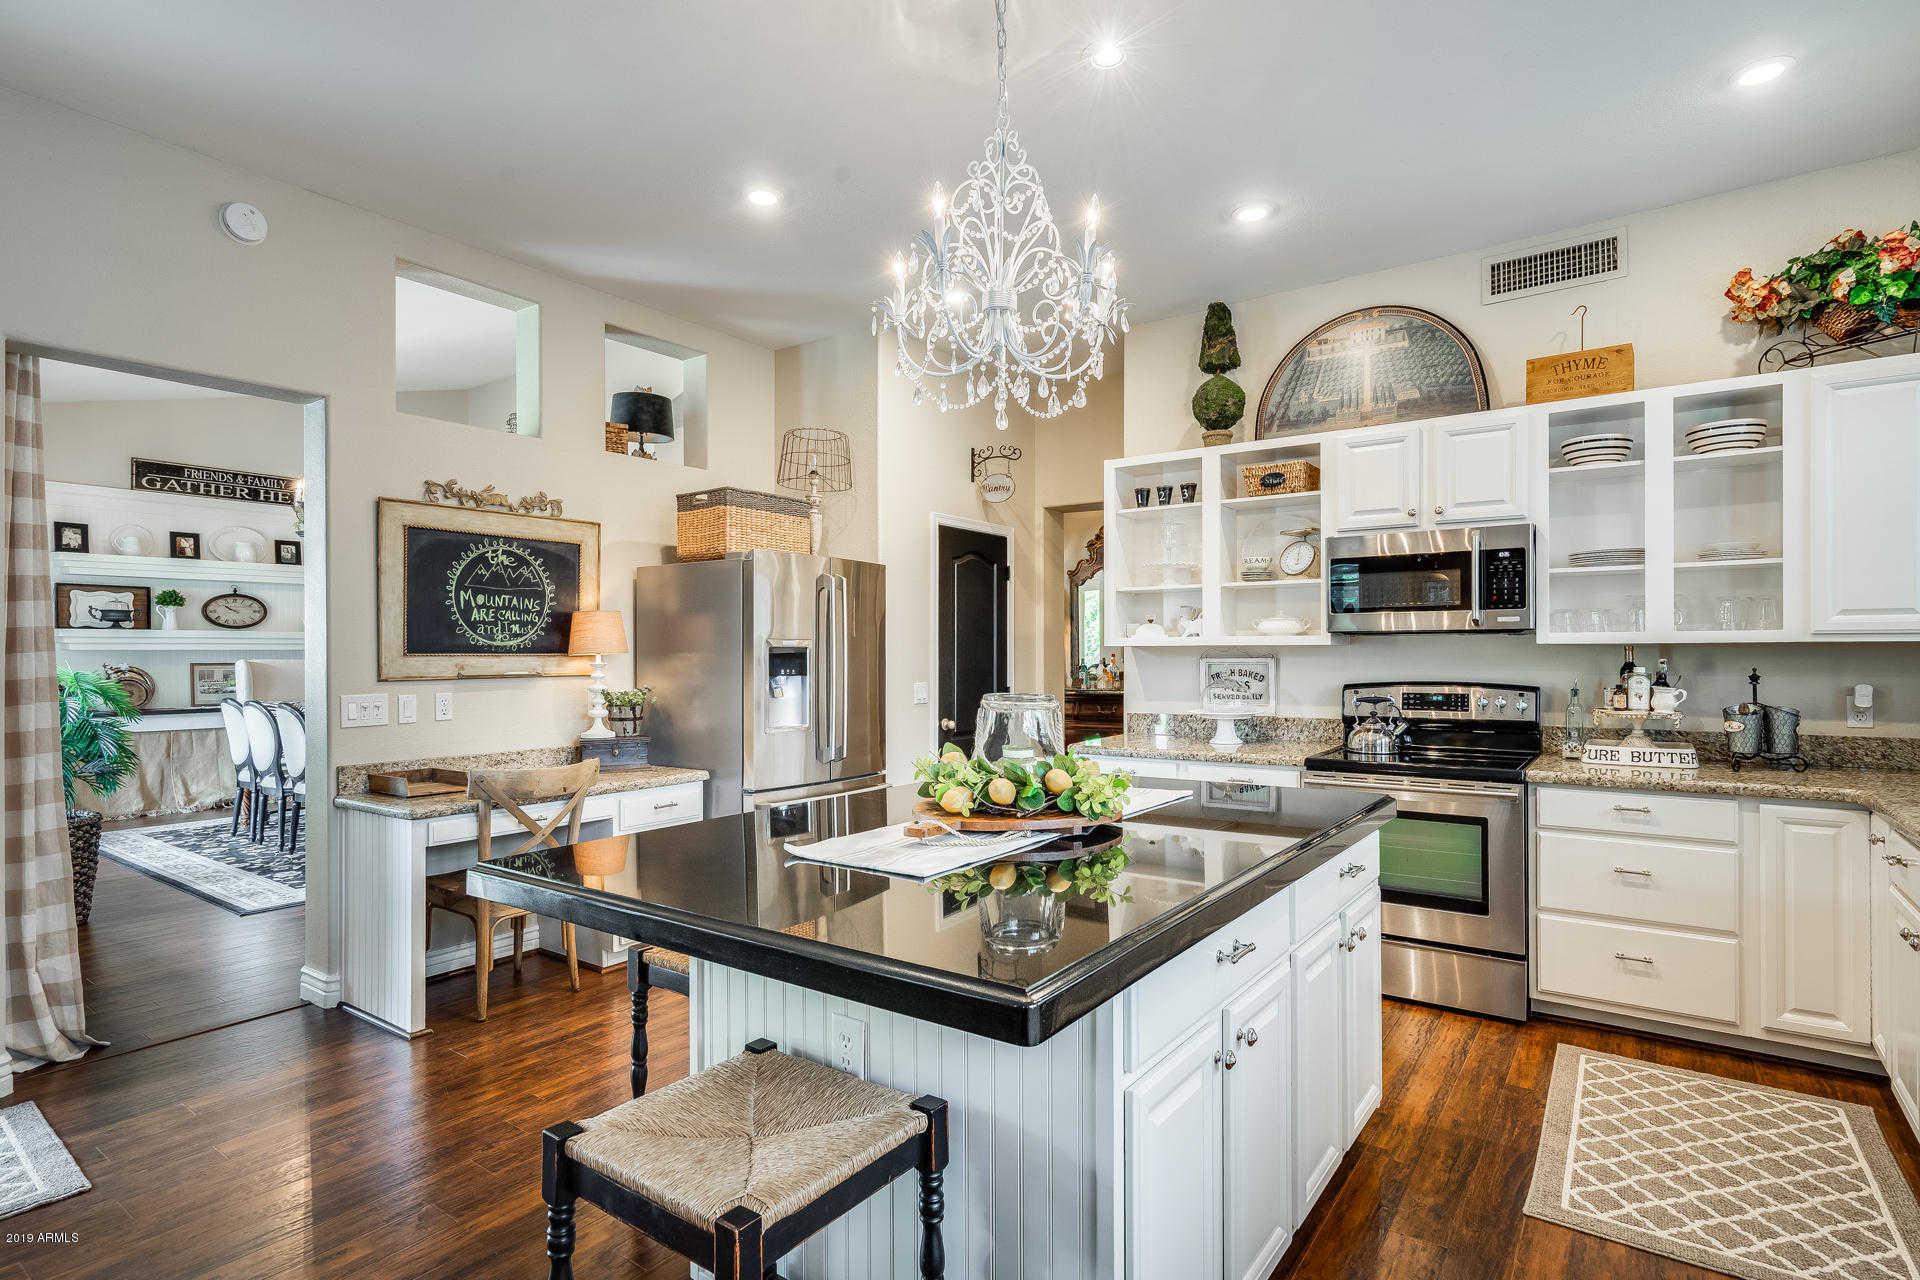 $409,900 - 3Br/2Ba - Home for Sale in Hillcrest Ranch, Glendale